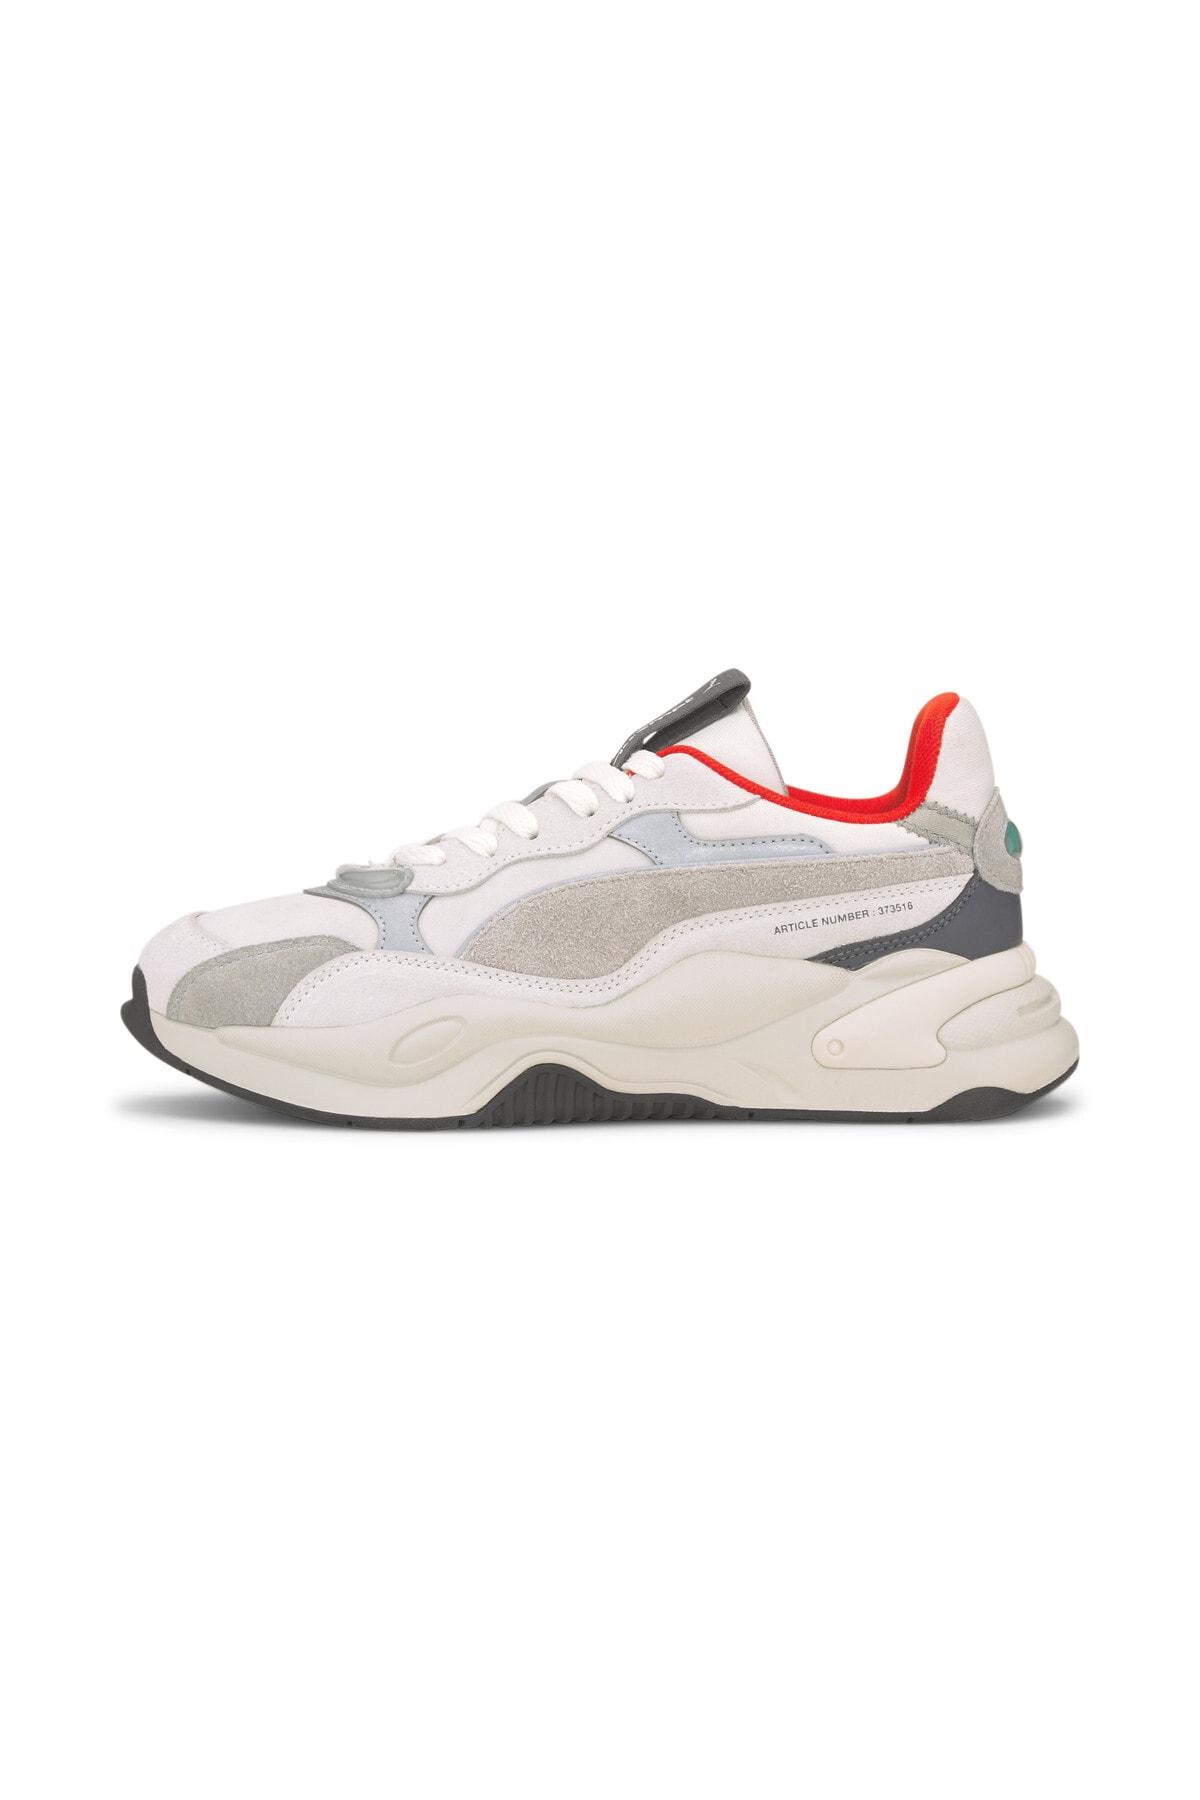 Puma X Attèmpt Rs-2k Ayakkabı 0